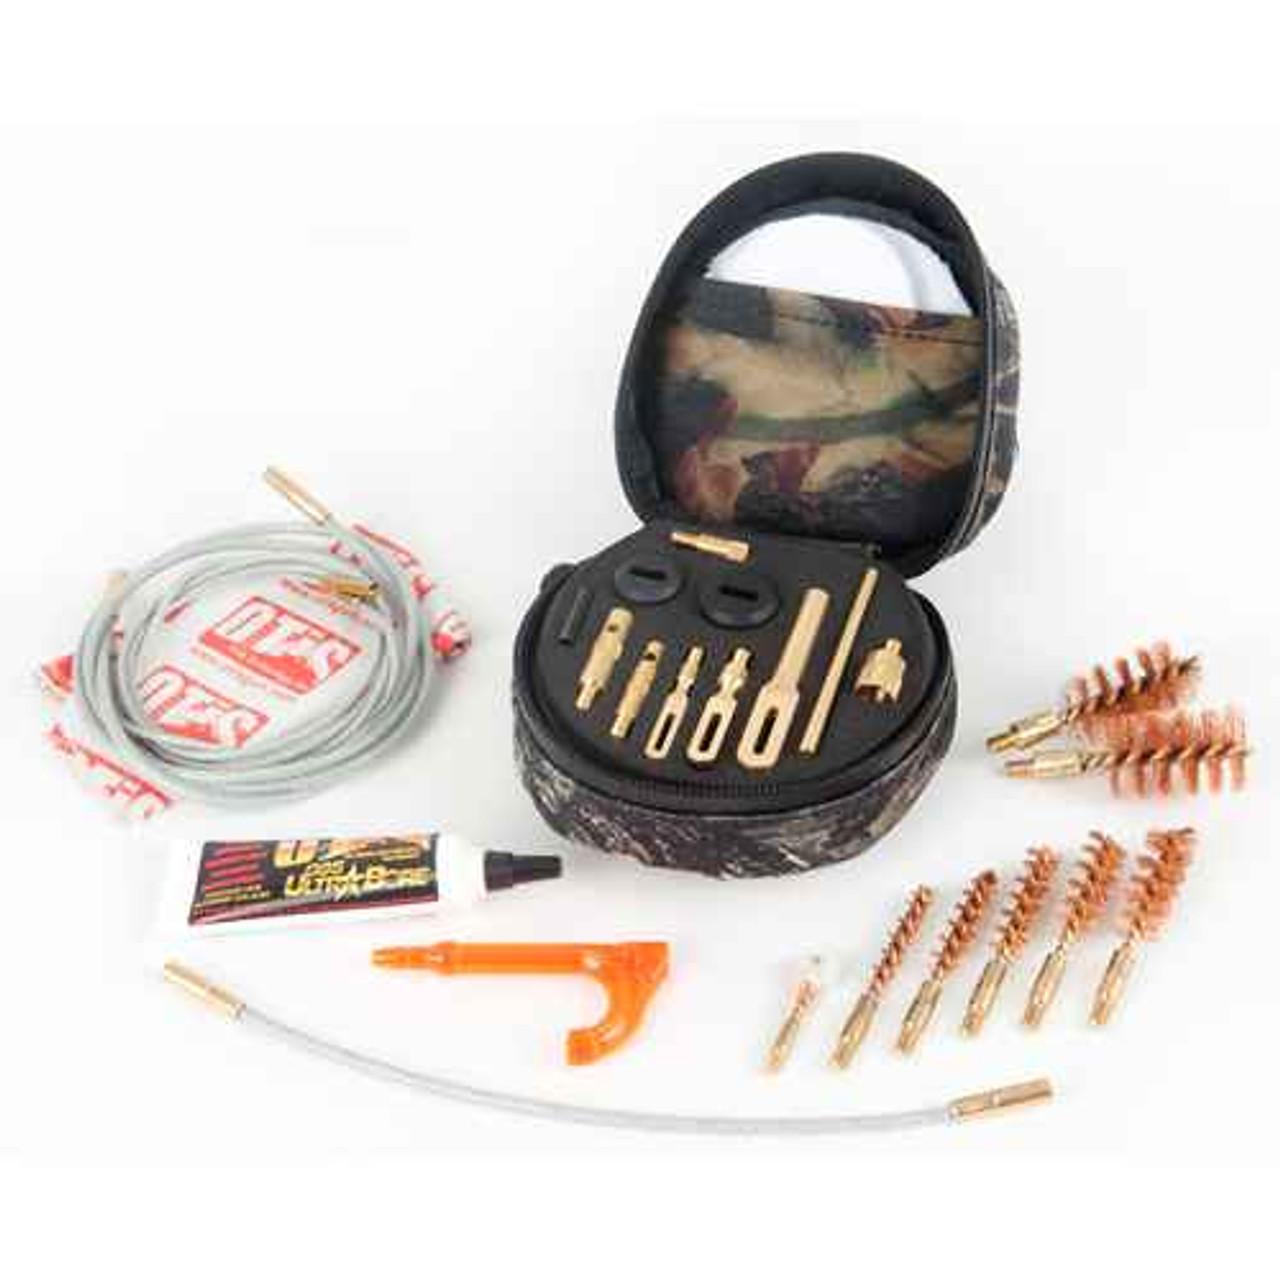 Otis Hard Core Hunter Gun Cleaning Kit, Mossy Oak Camo